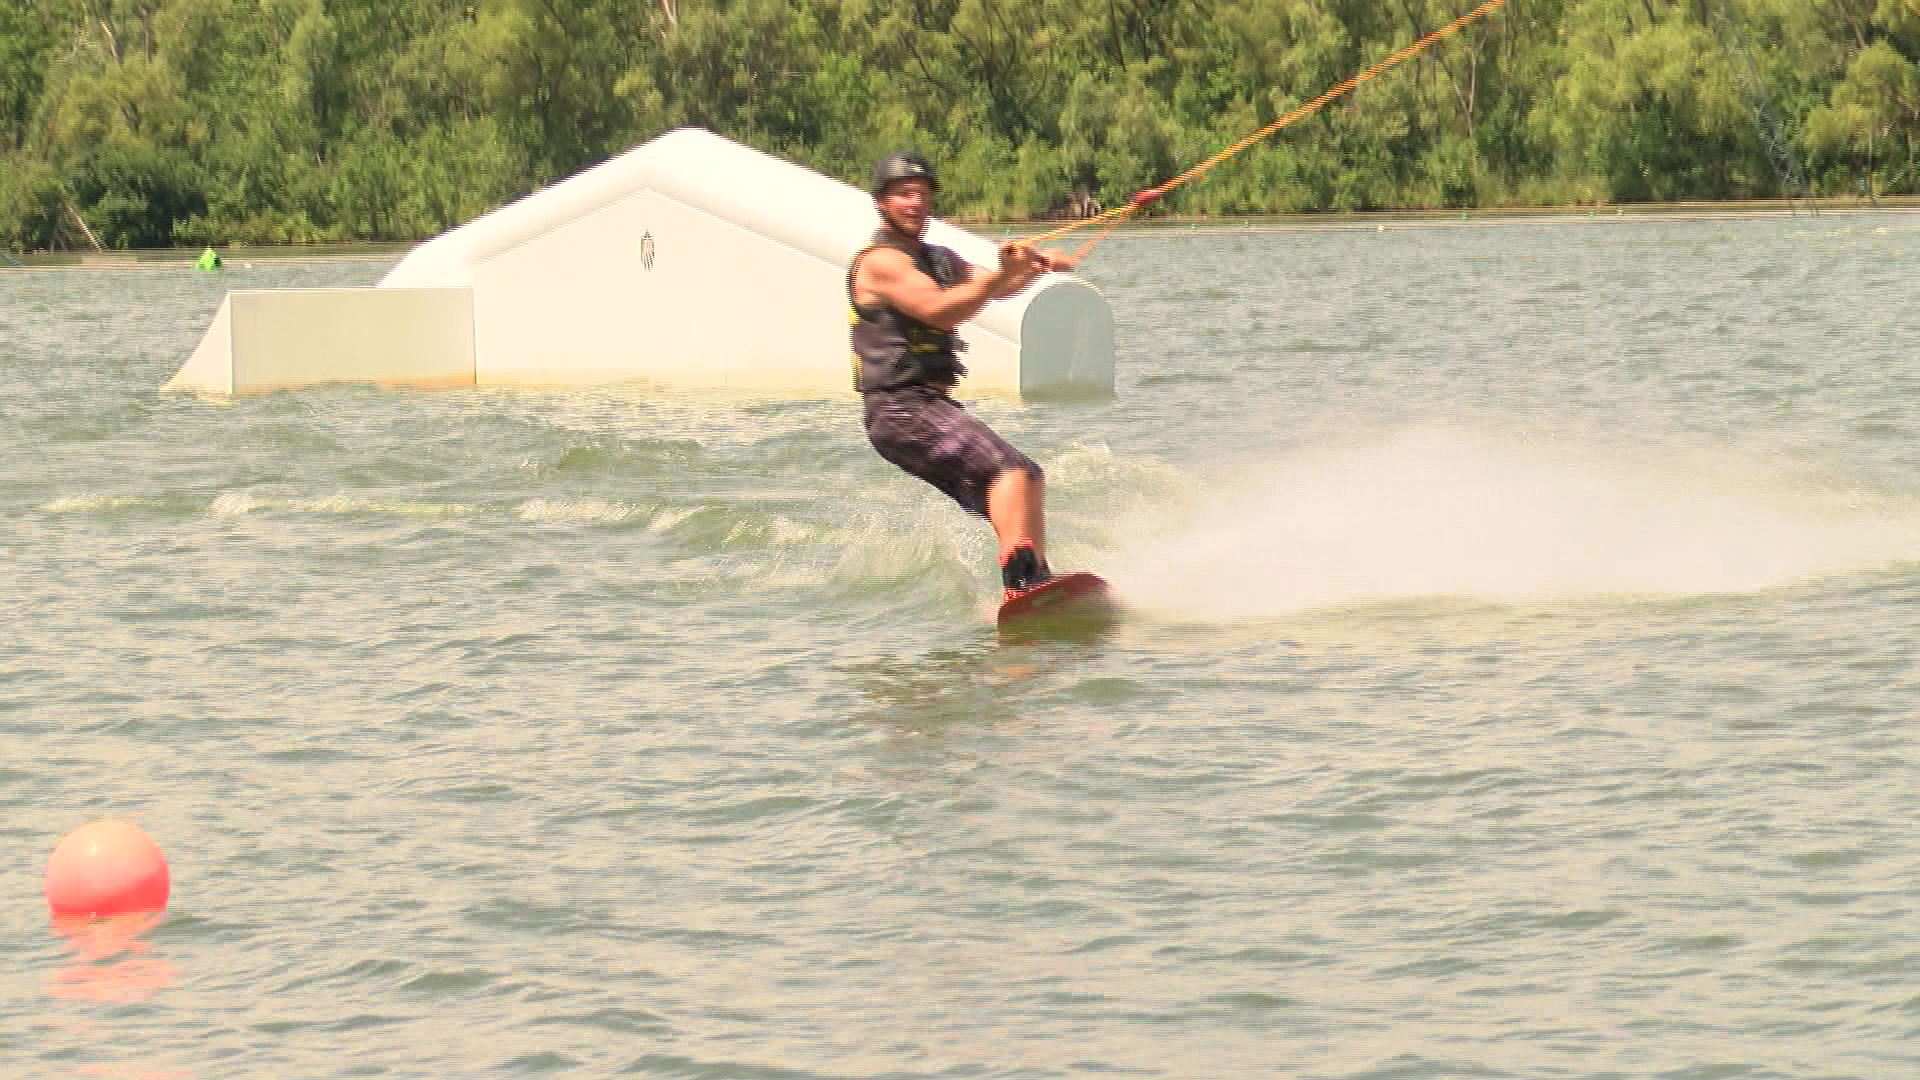 wakeboarder_1469395096879.jpg